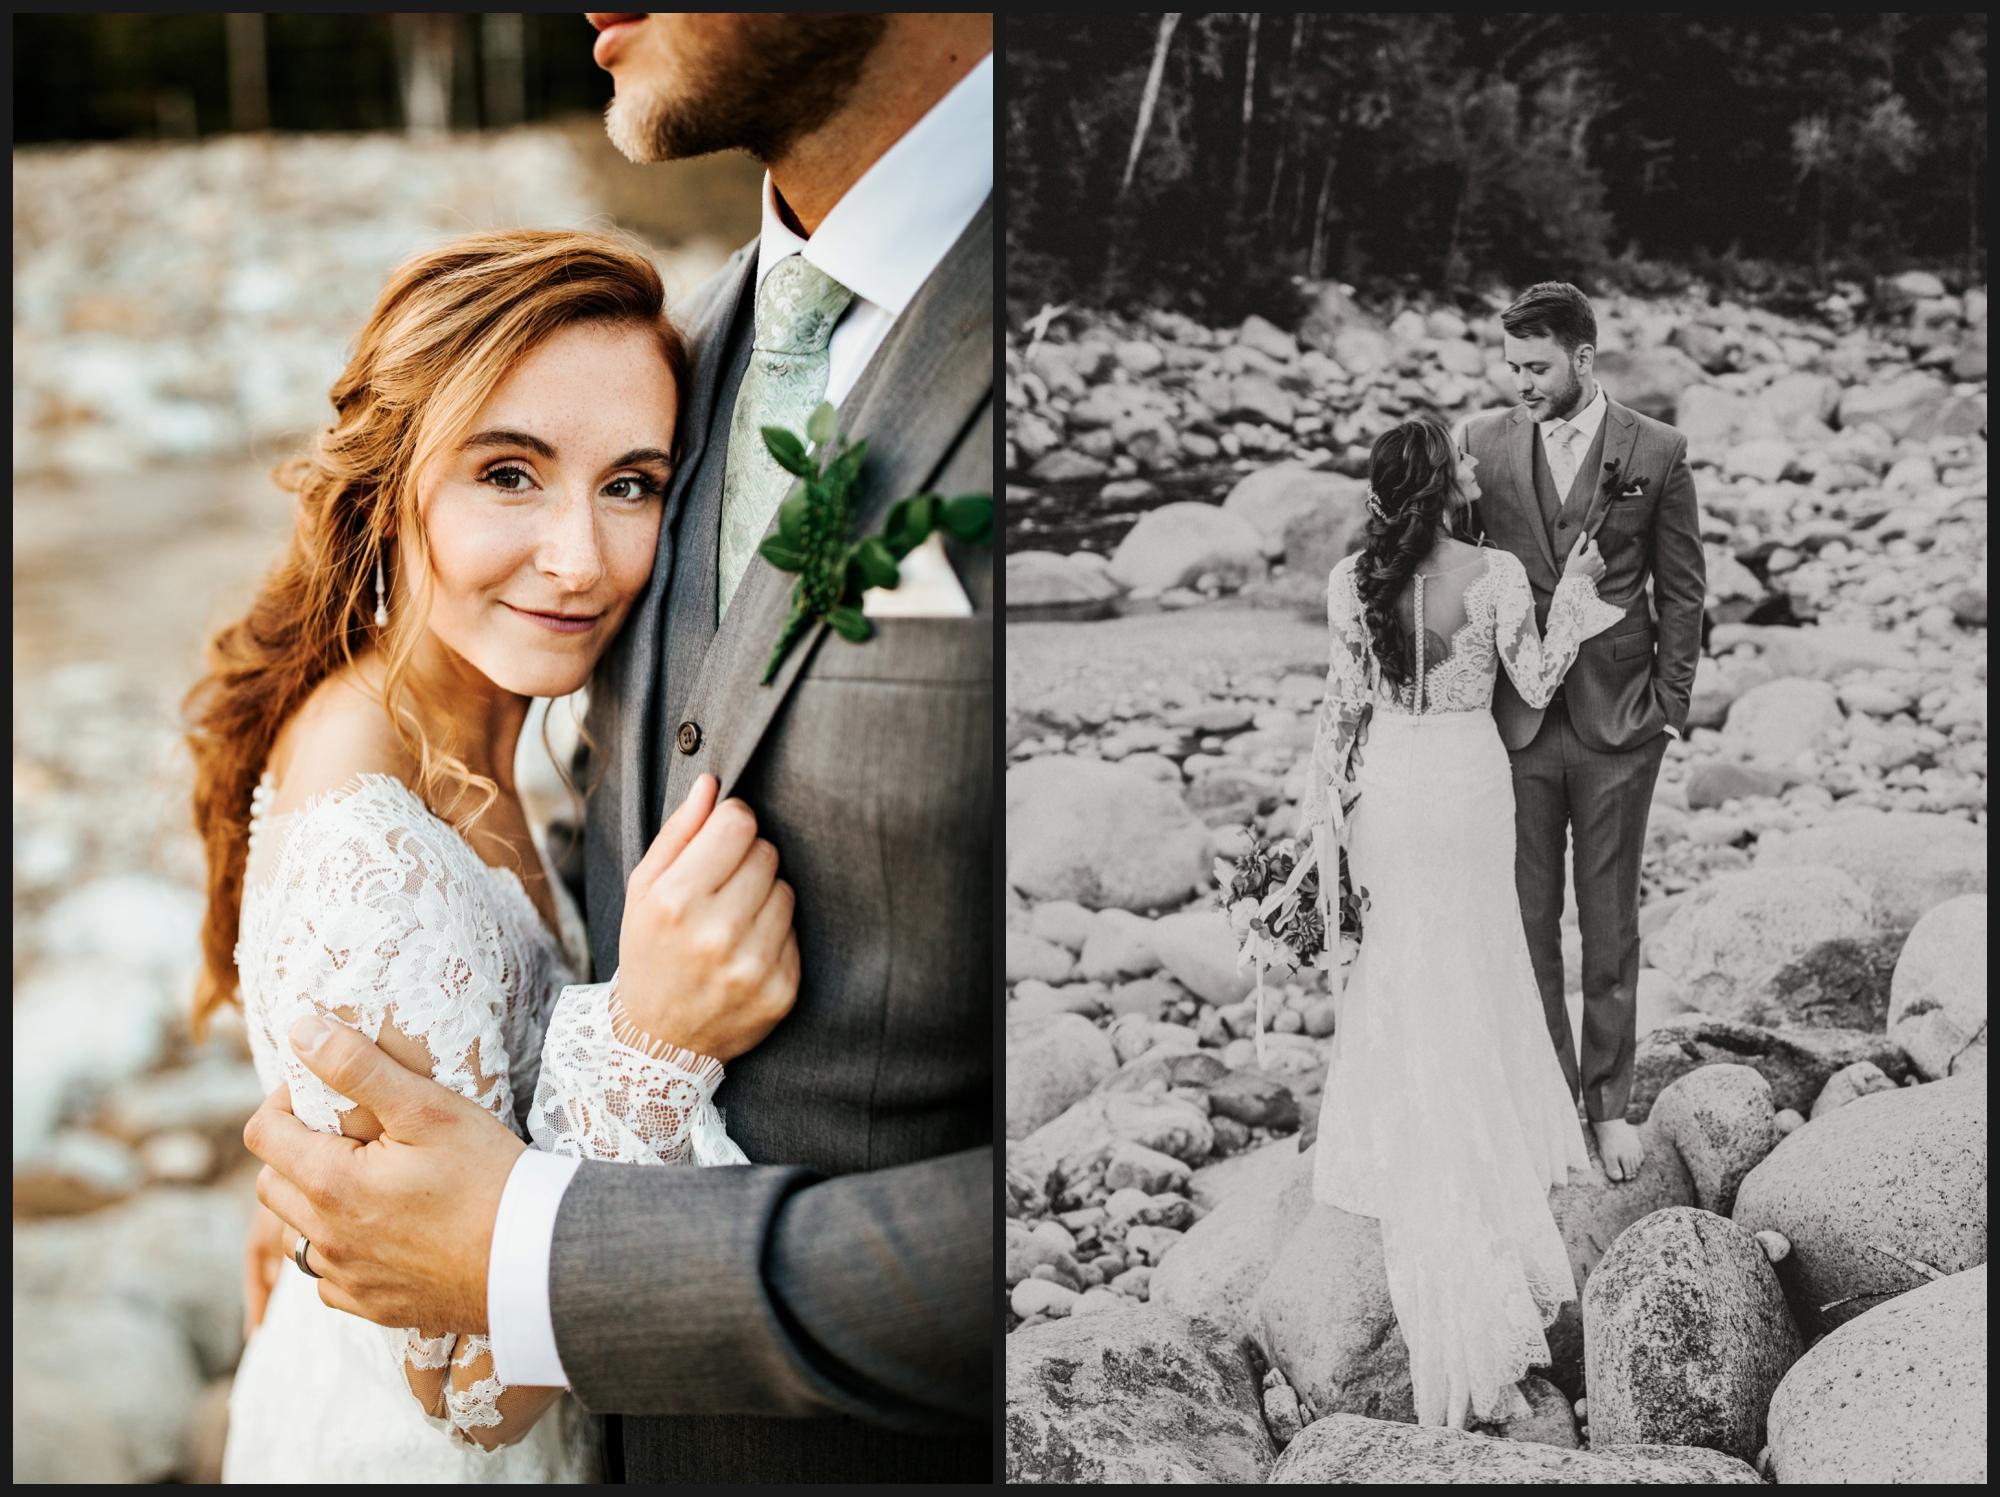 Orlando-Wedding-Photographer-destination-wedding-photographer-florida-wedding-photographer-hawaii-wedding-photographer_0109.jpg